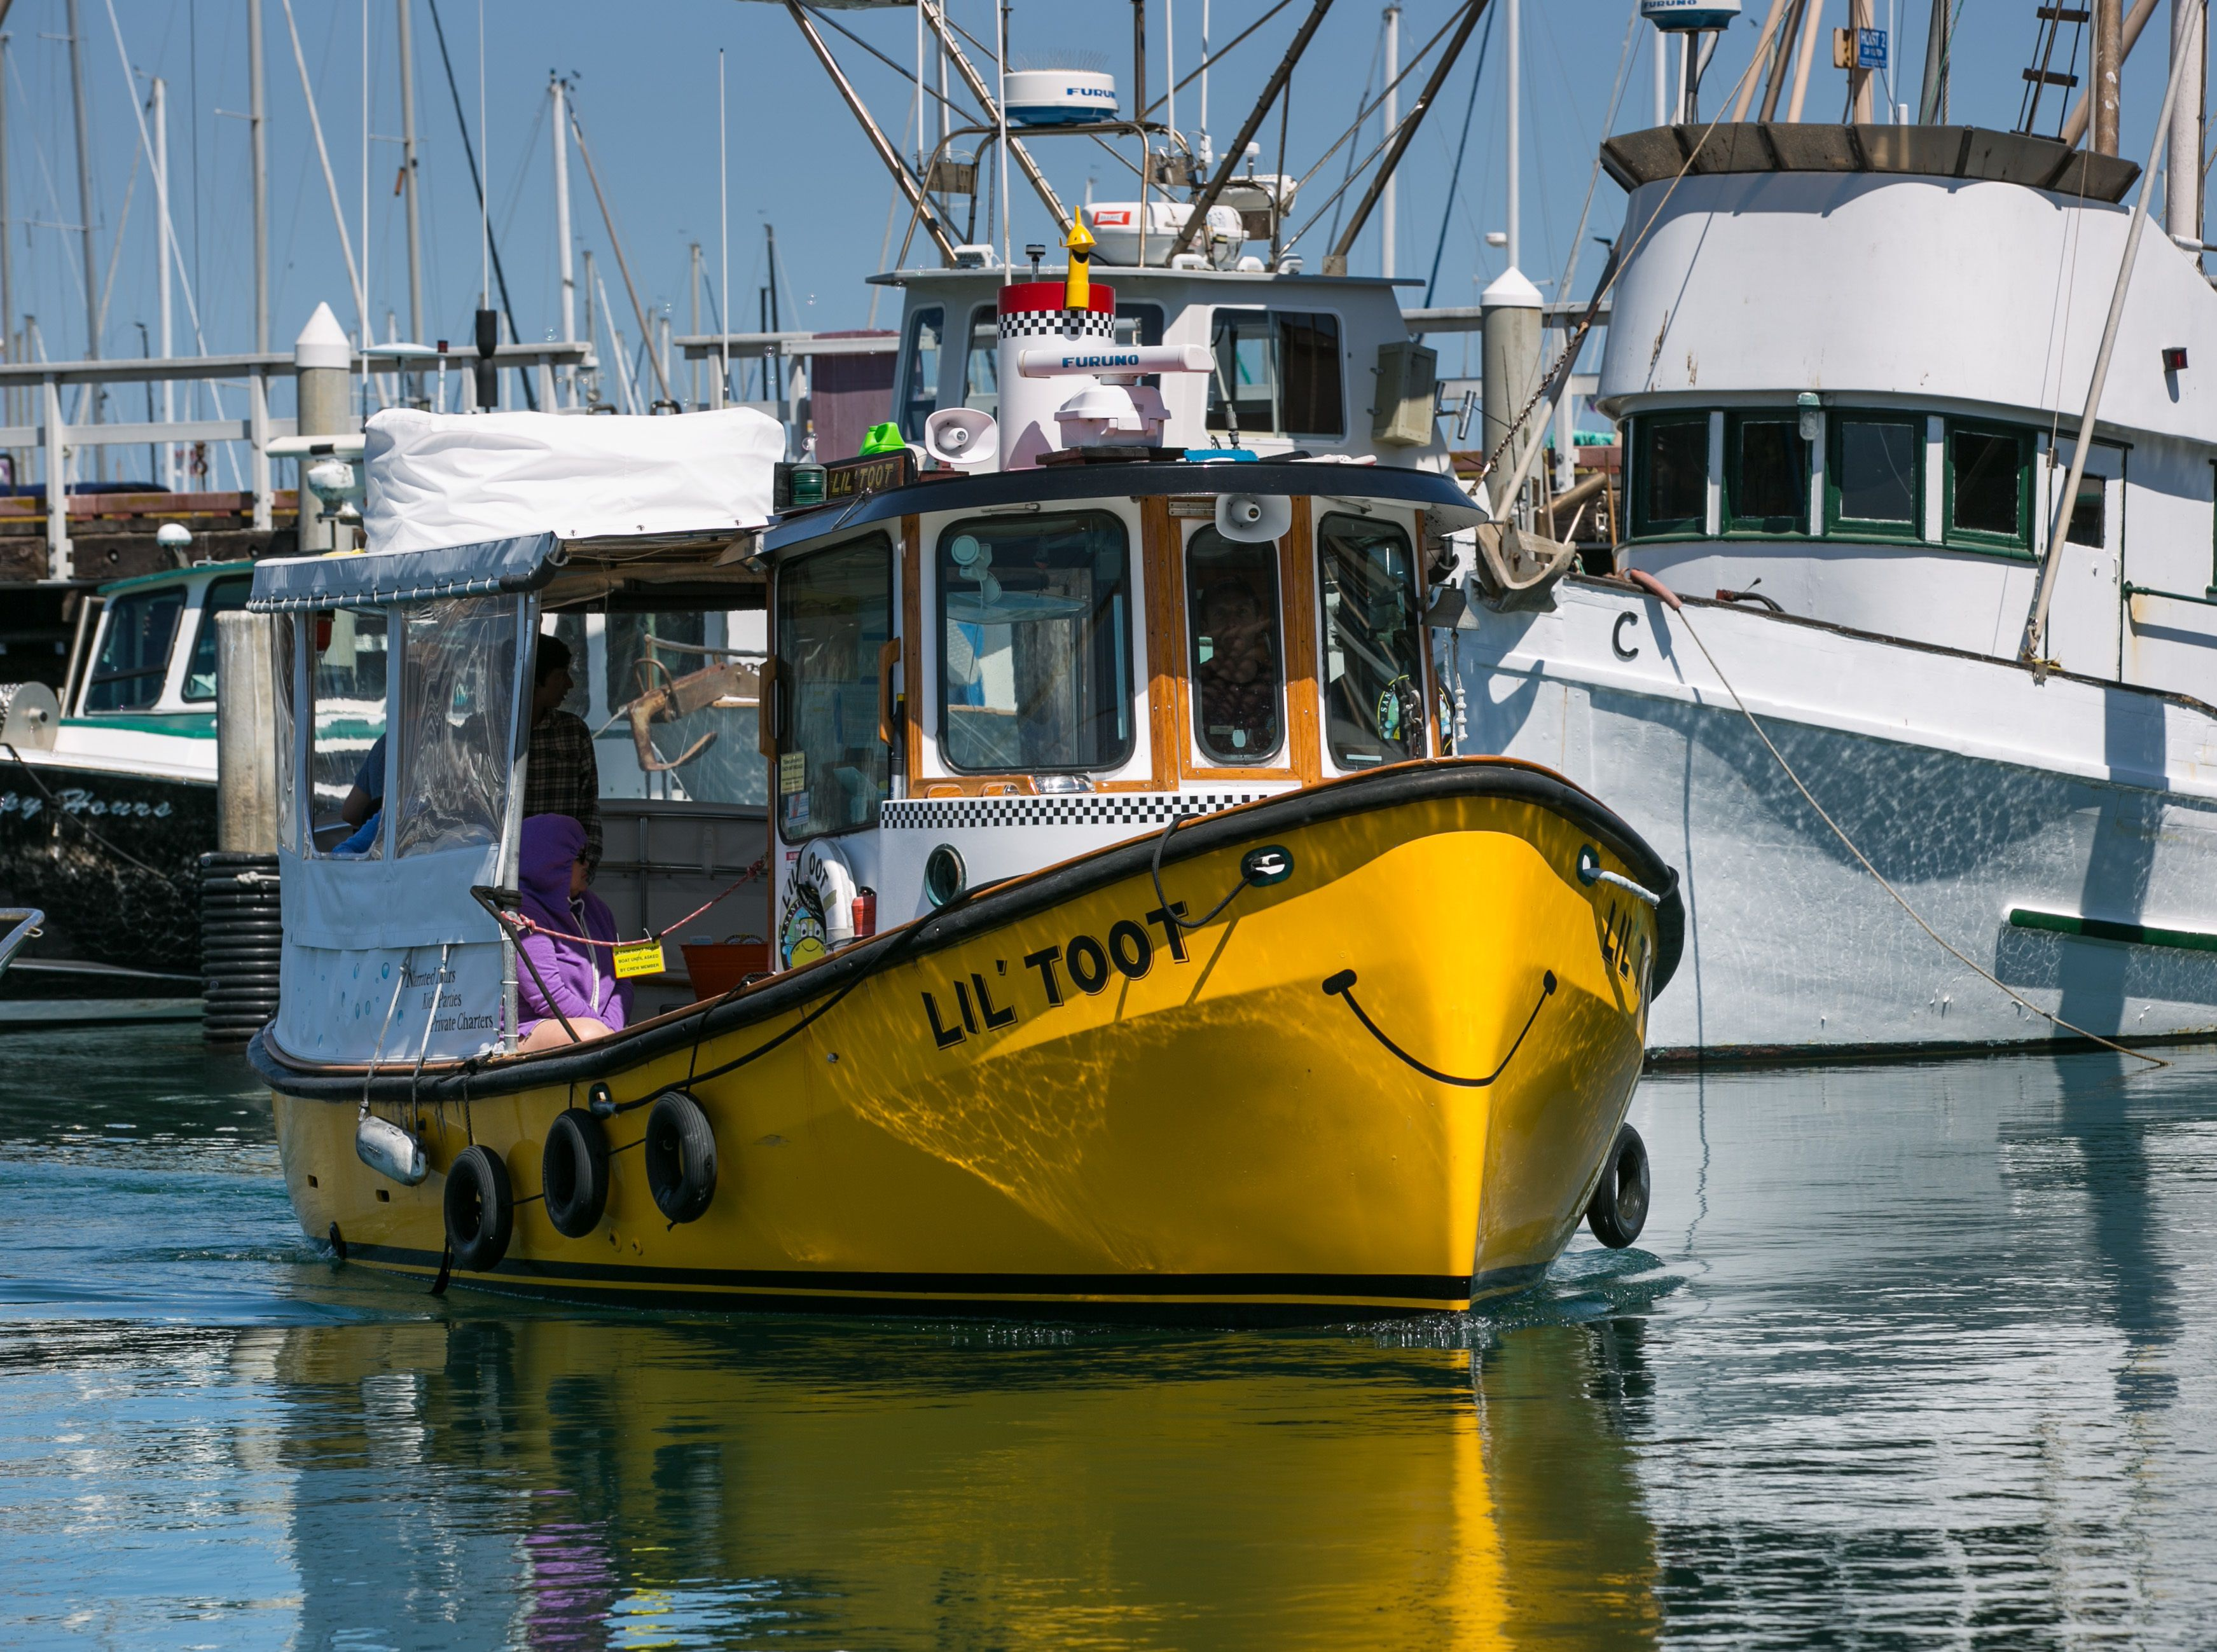 Lil' Toot Water Taxi in Santa Barbara